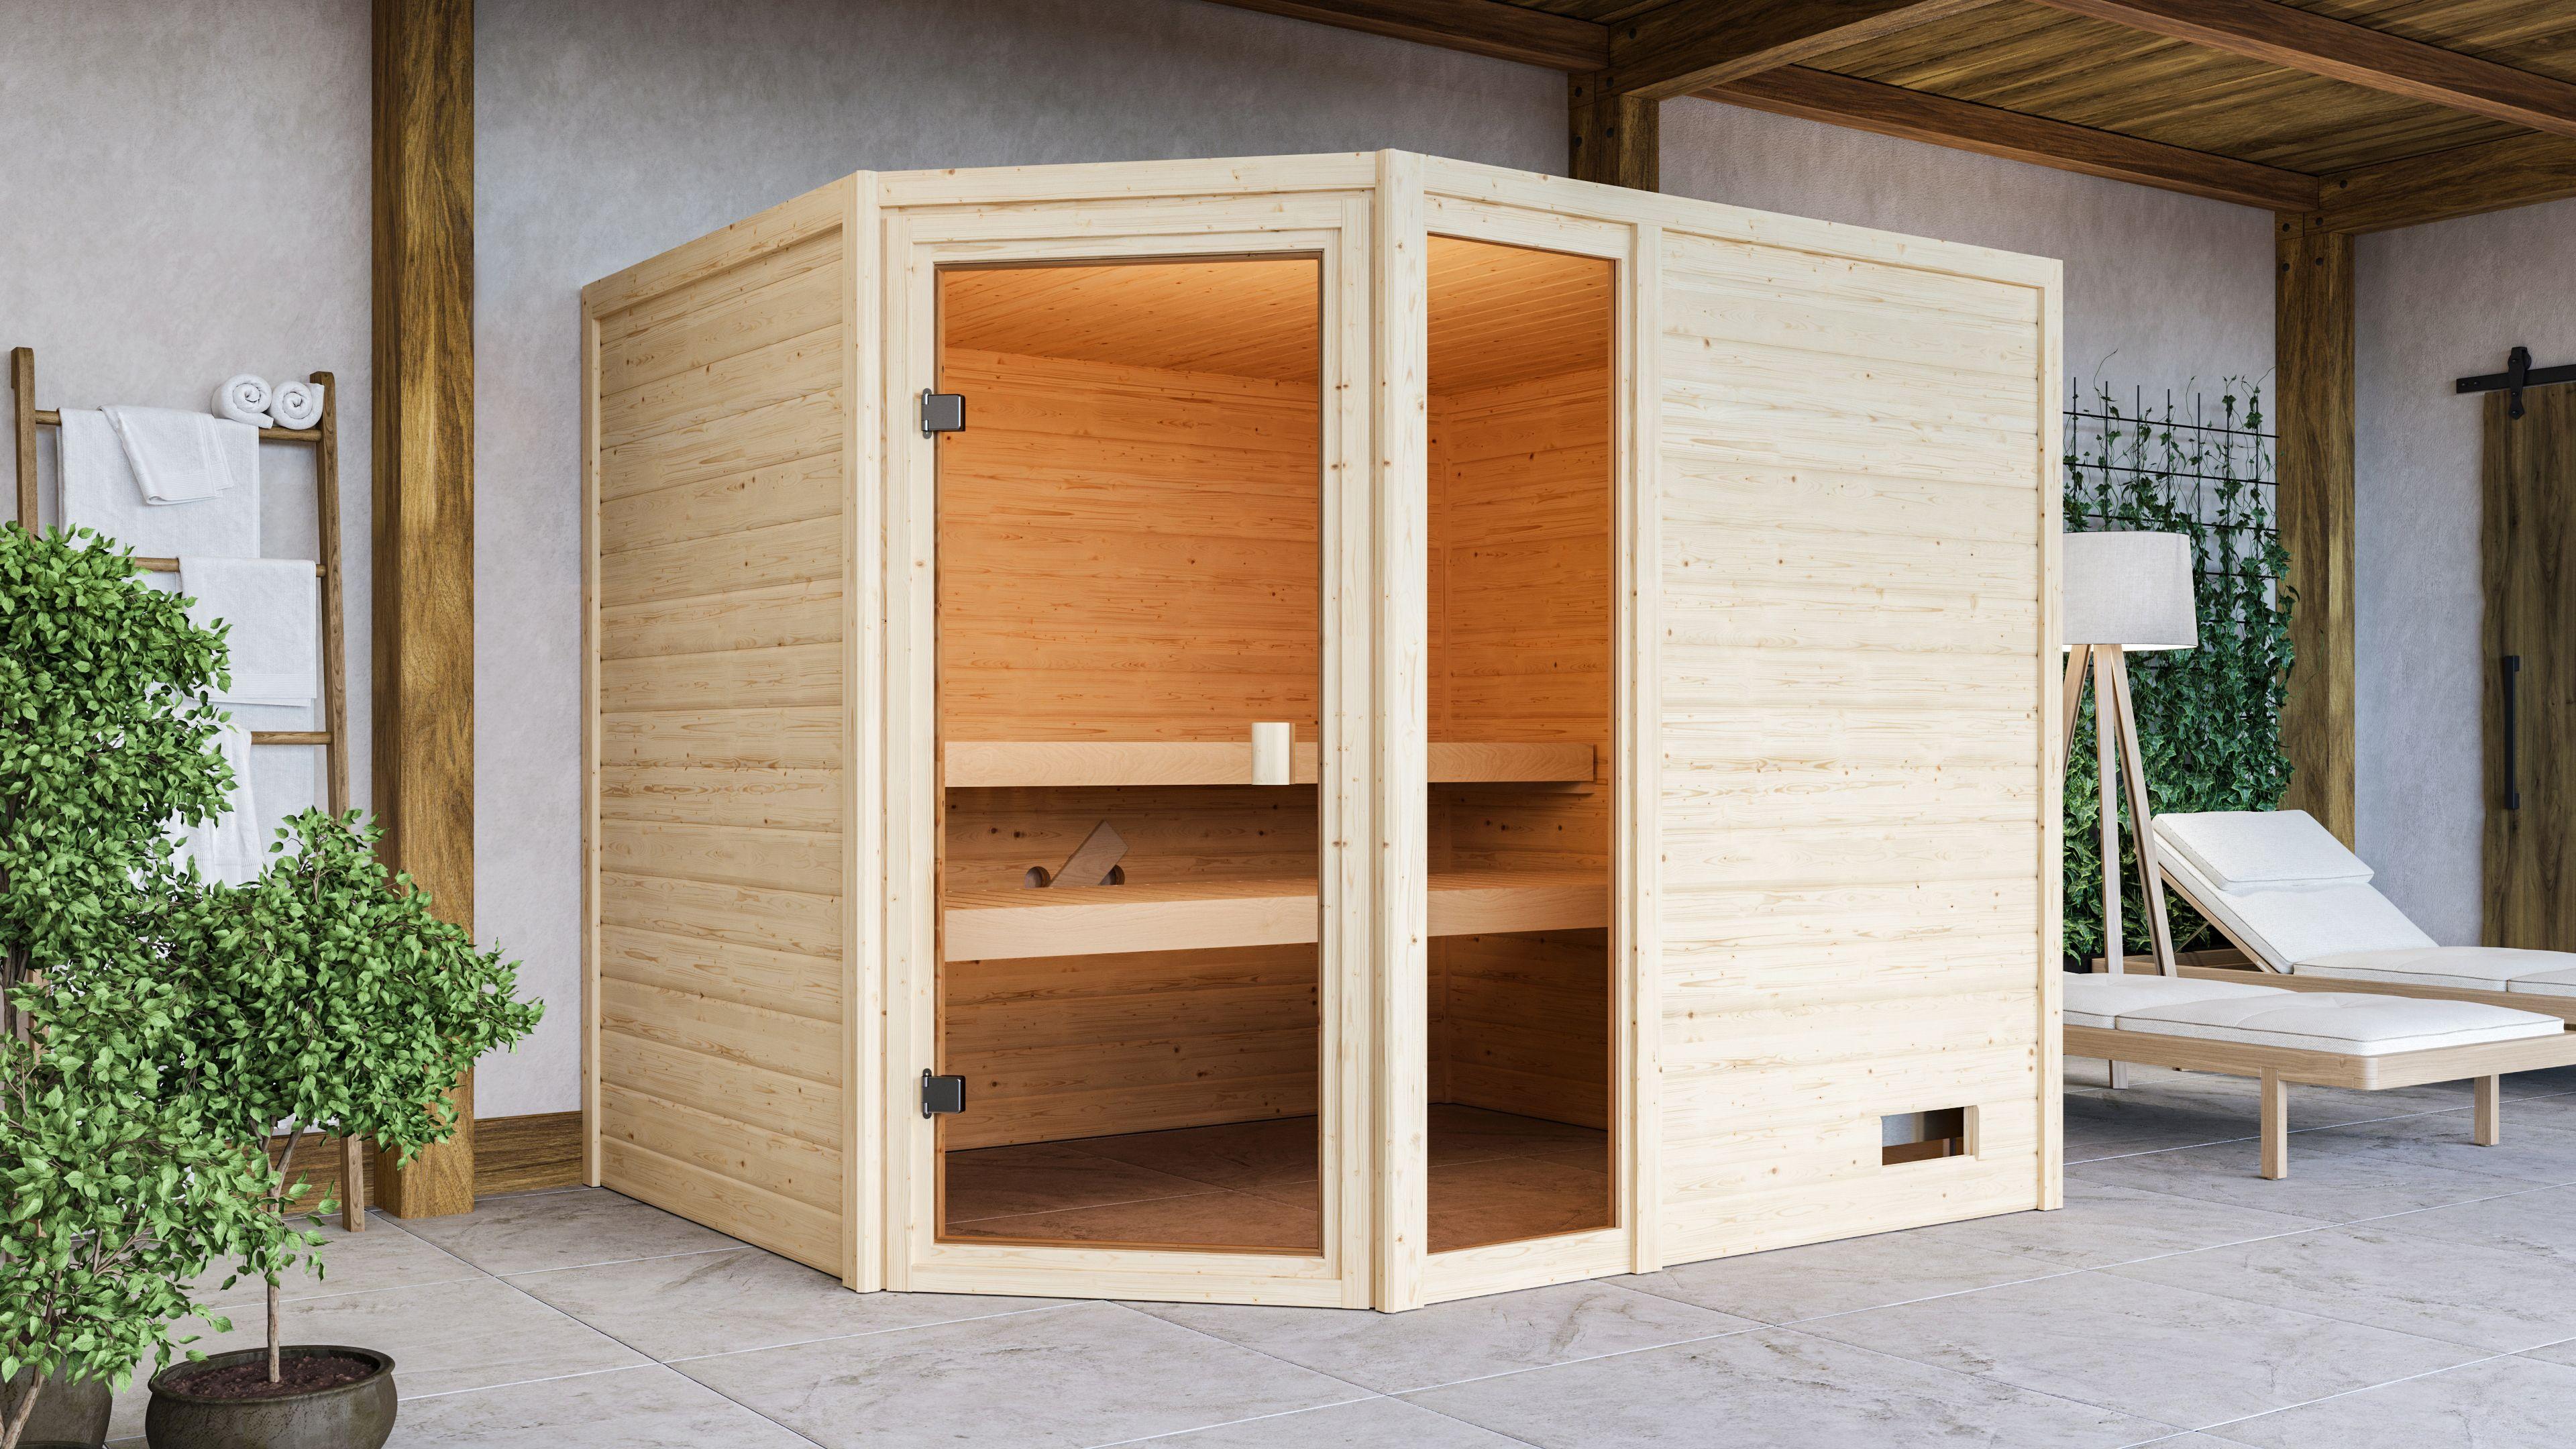 Woodfeeling Sauna Lola 38mm Saunaofen 9 kW intern Bild 5